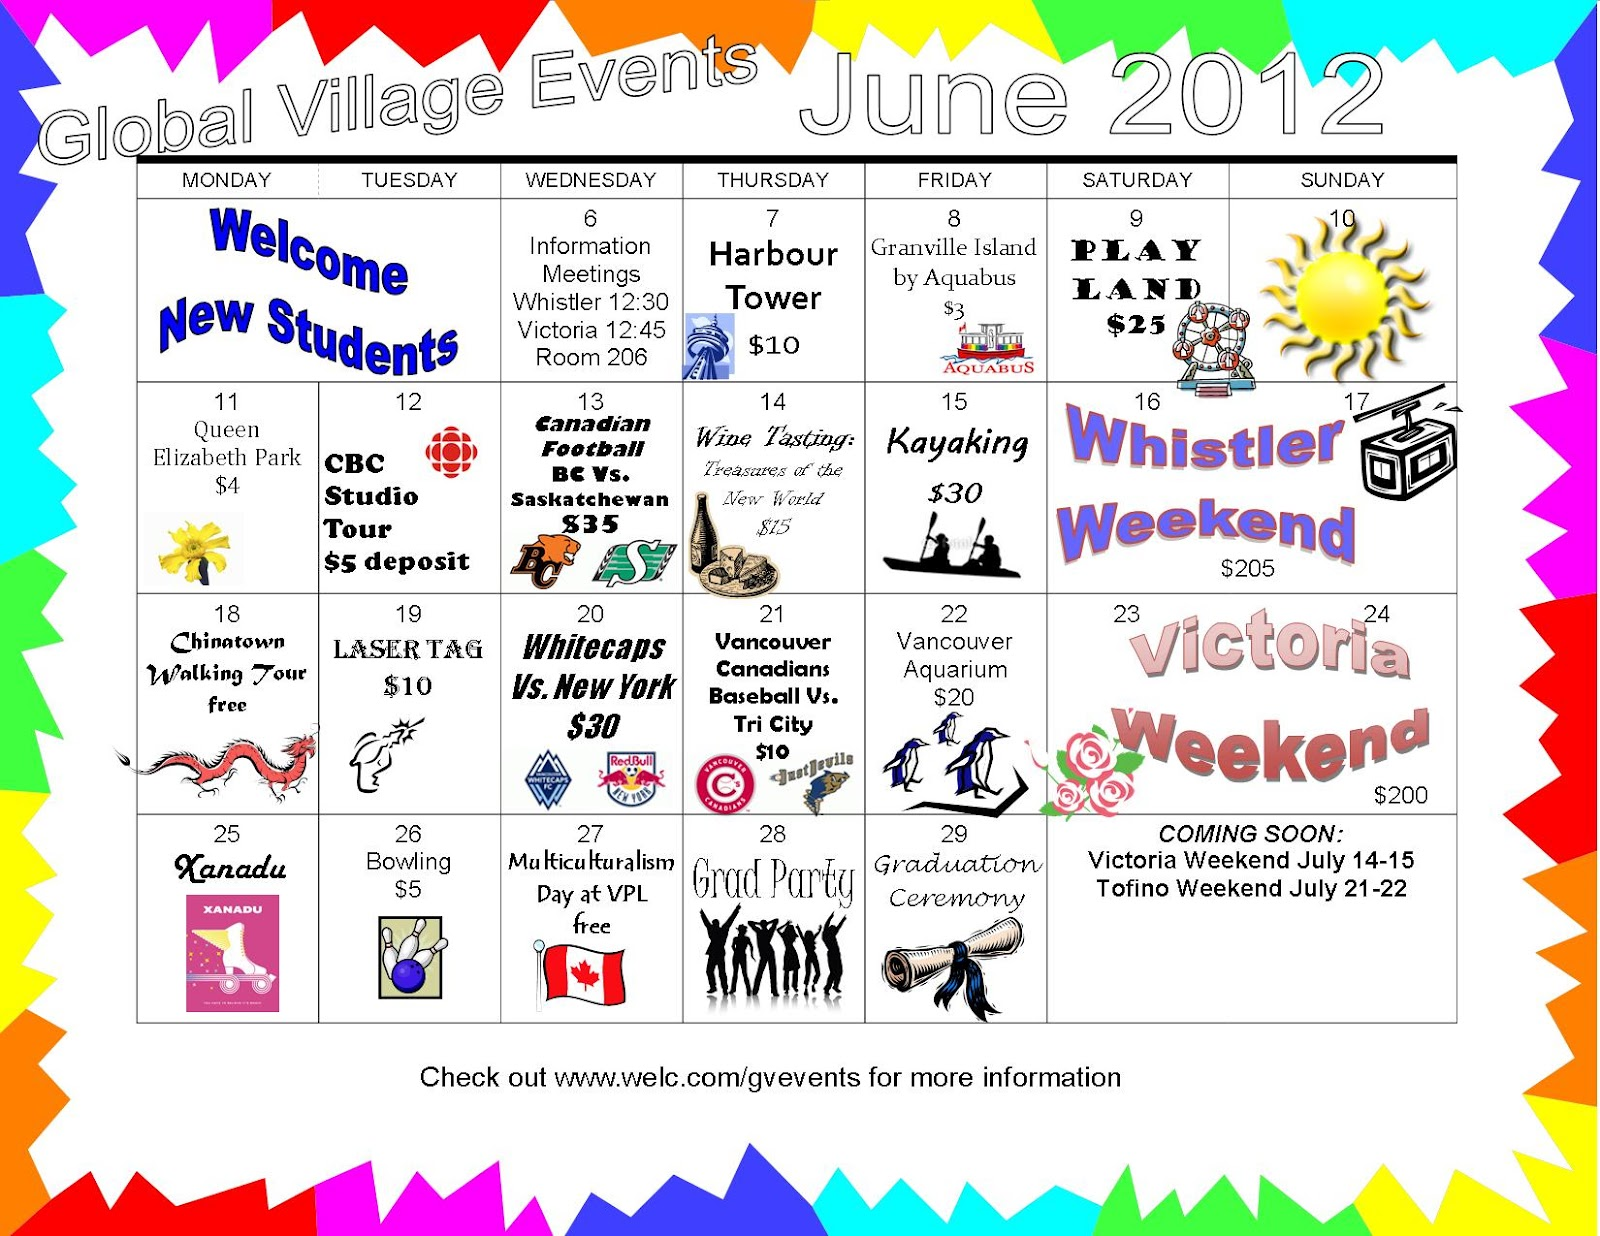 June Calendar Events : Global village vancouver events calendar